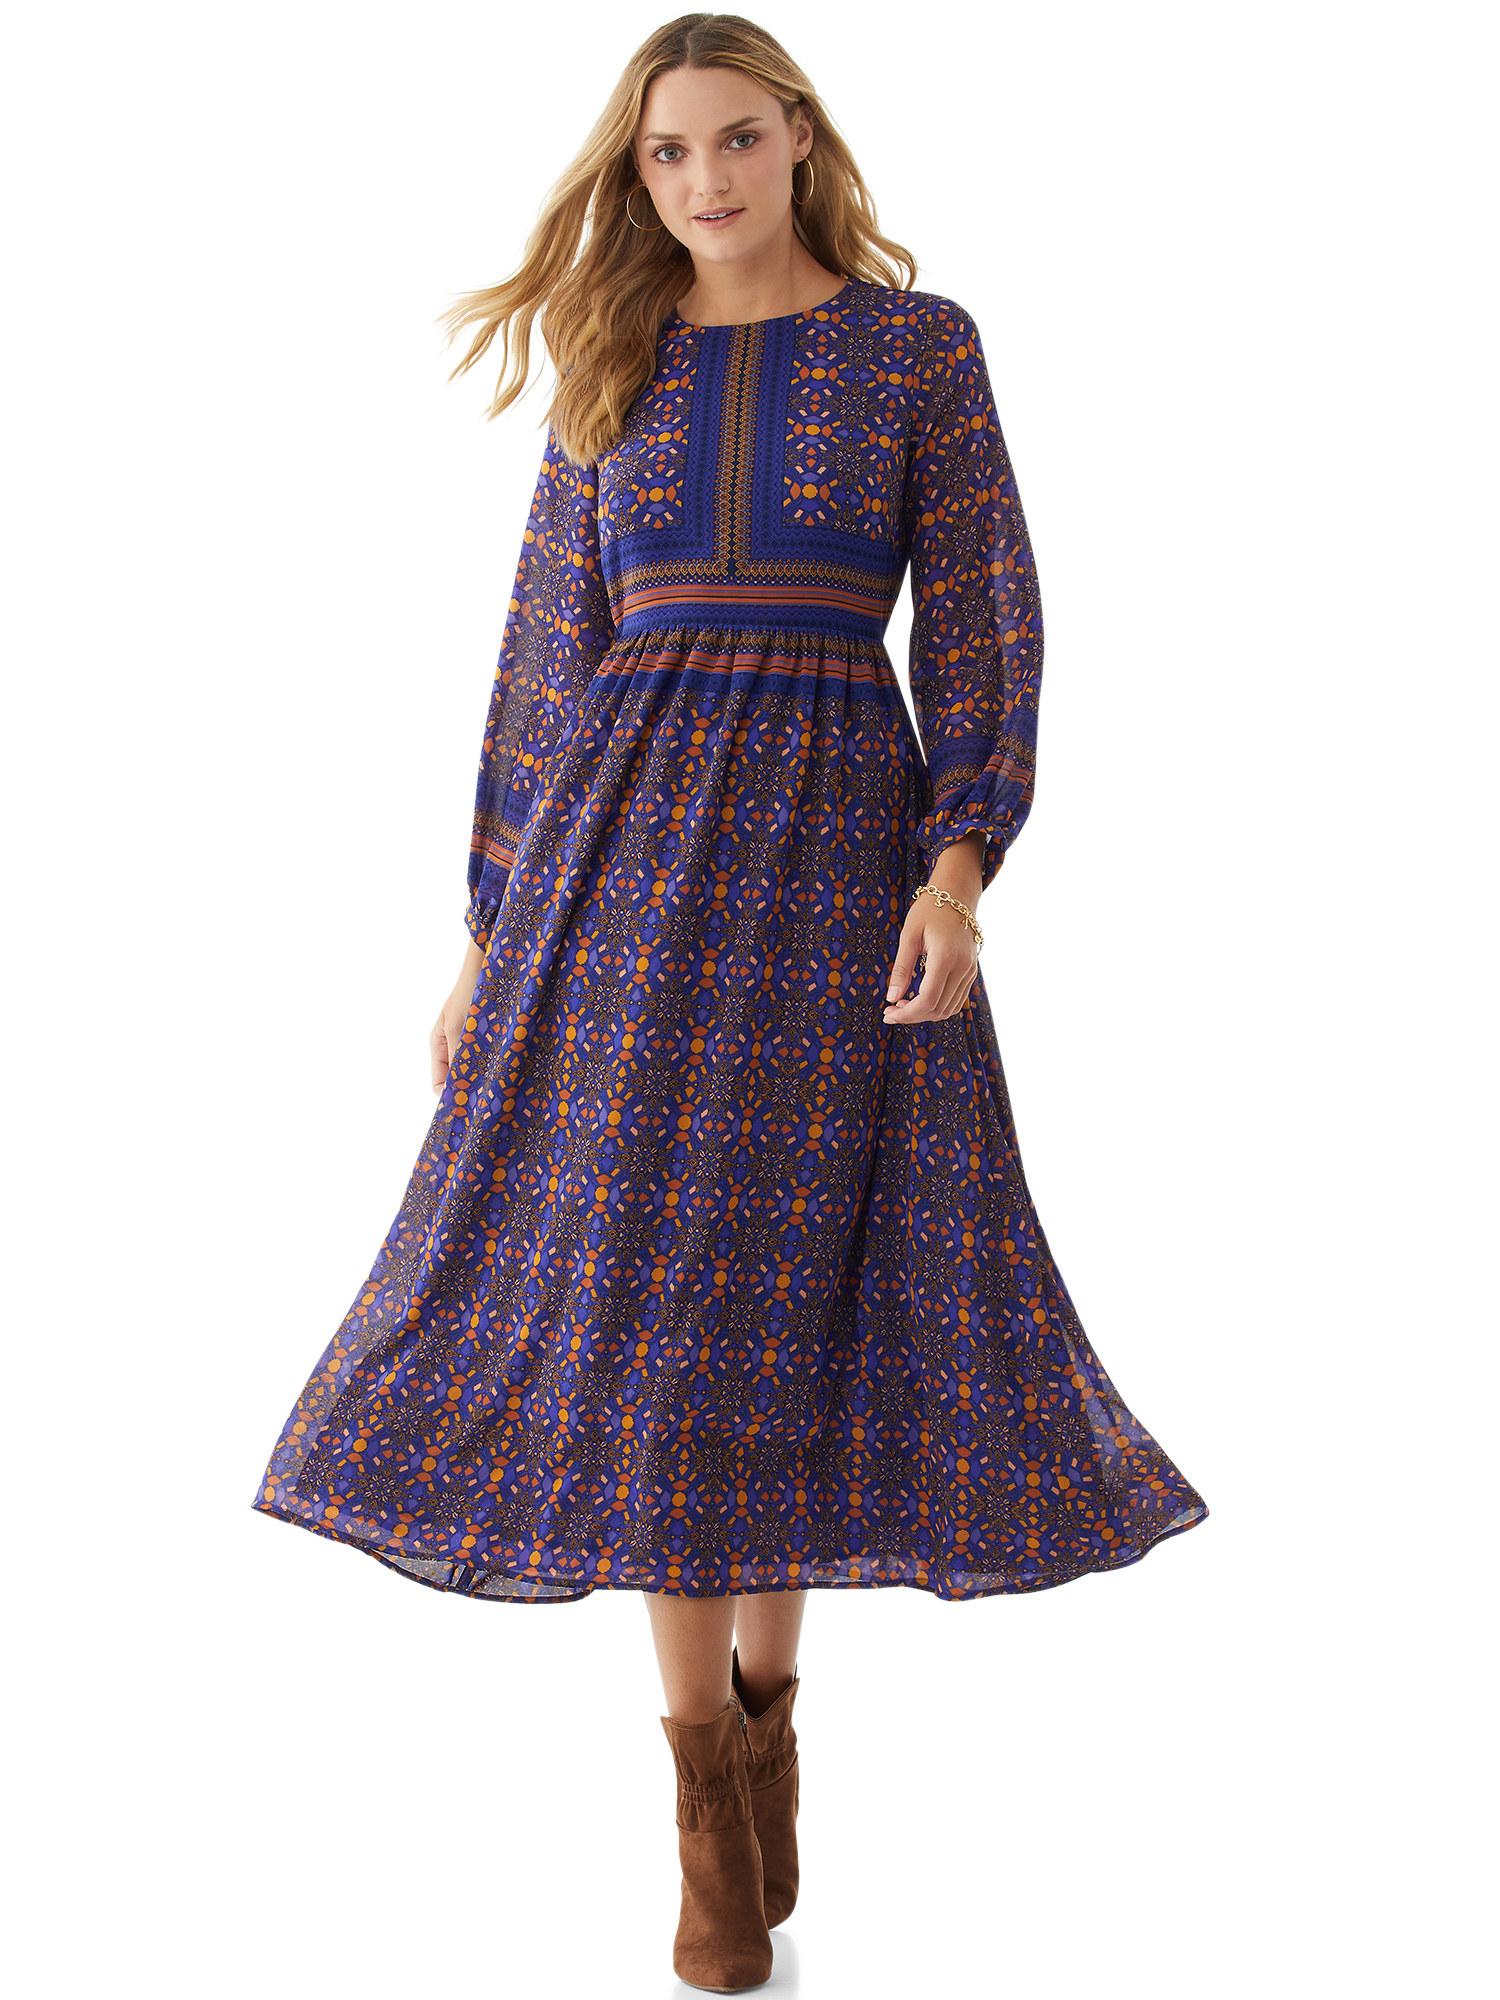 Model wearing printed maxi dress